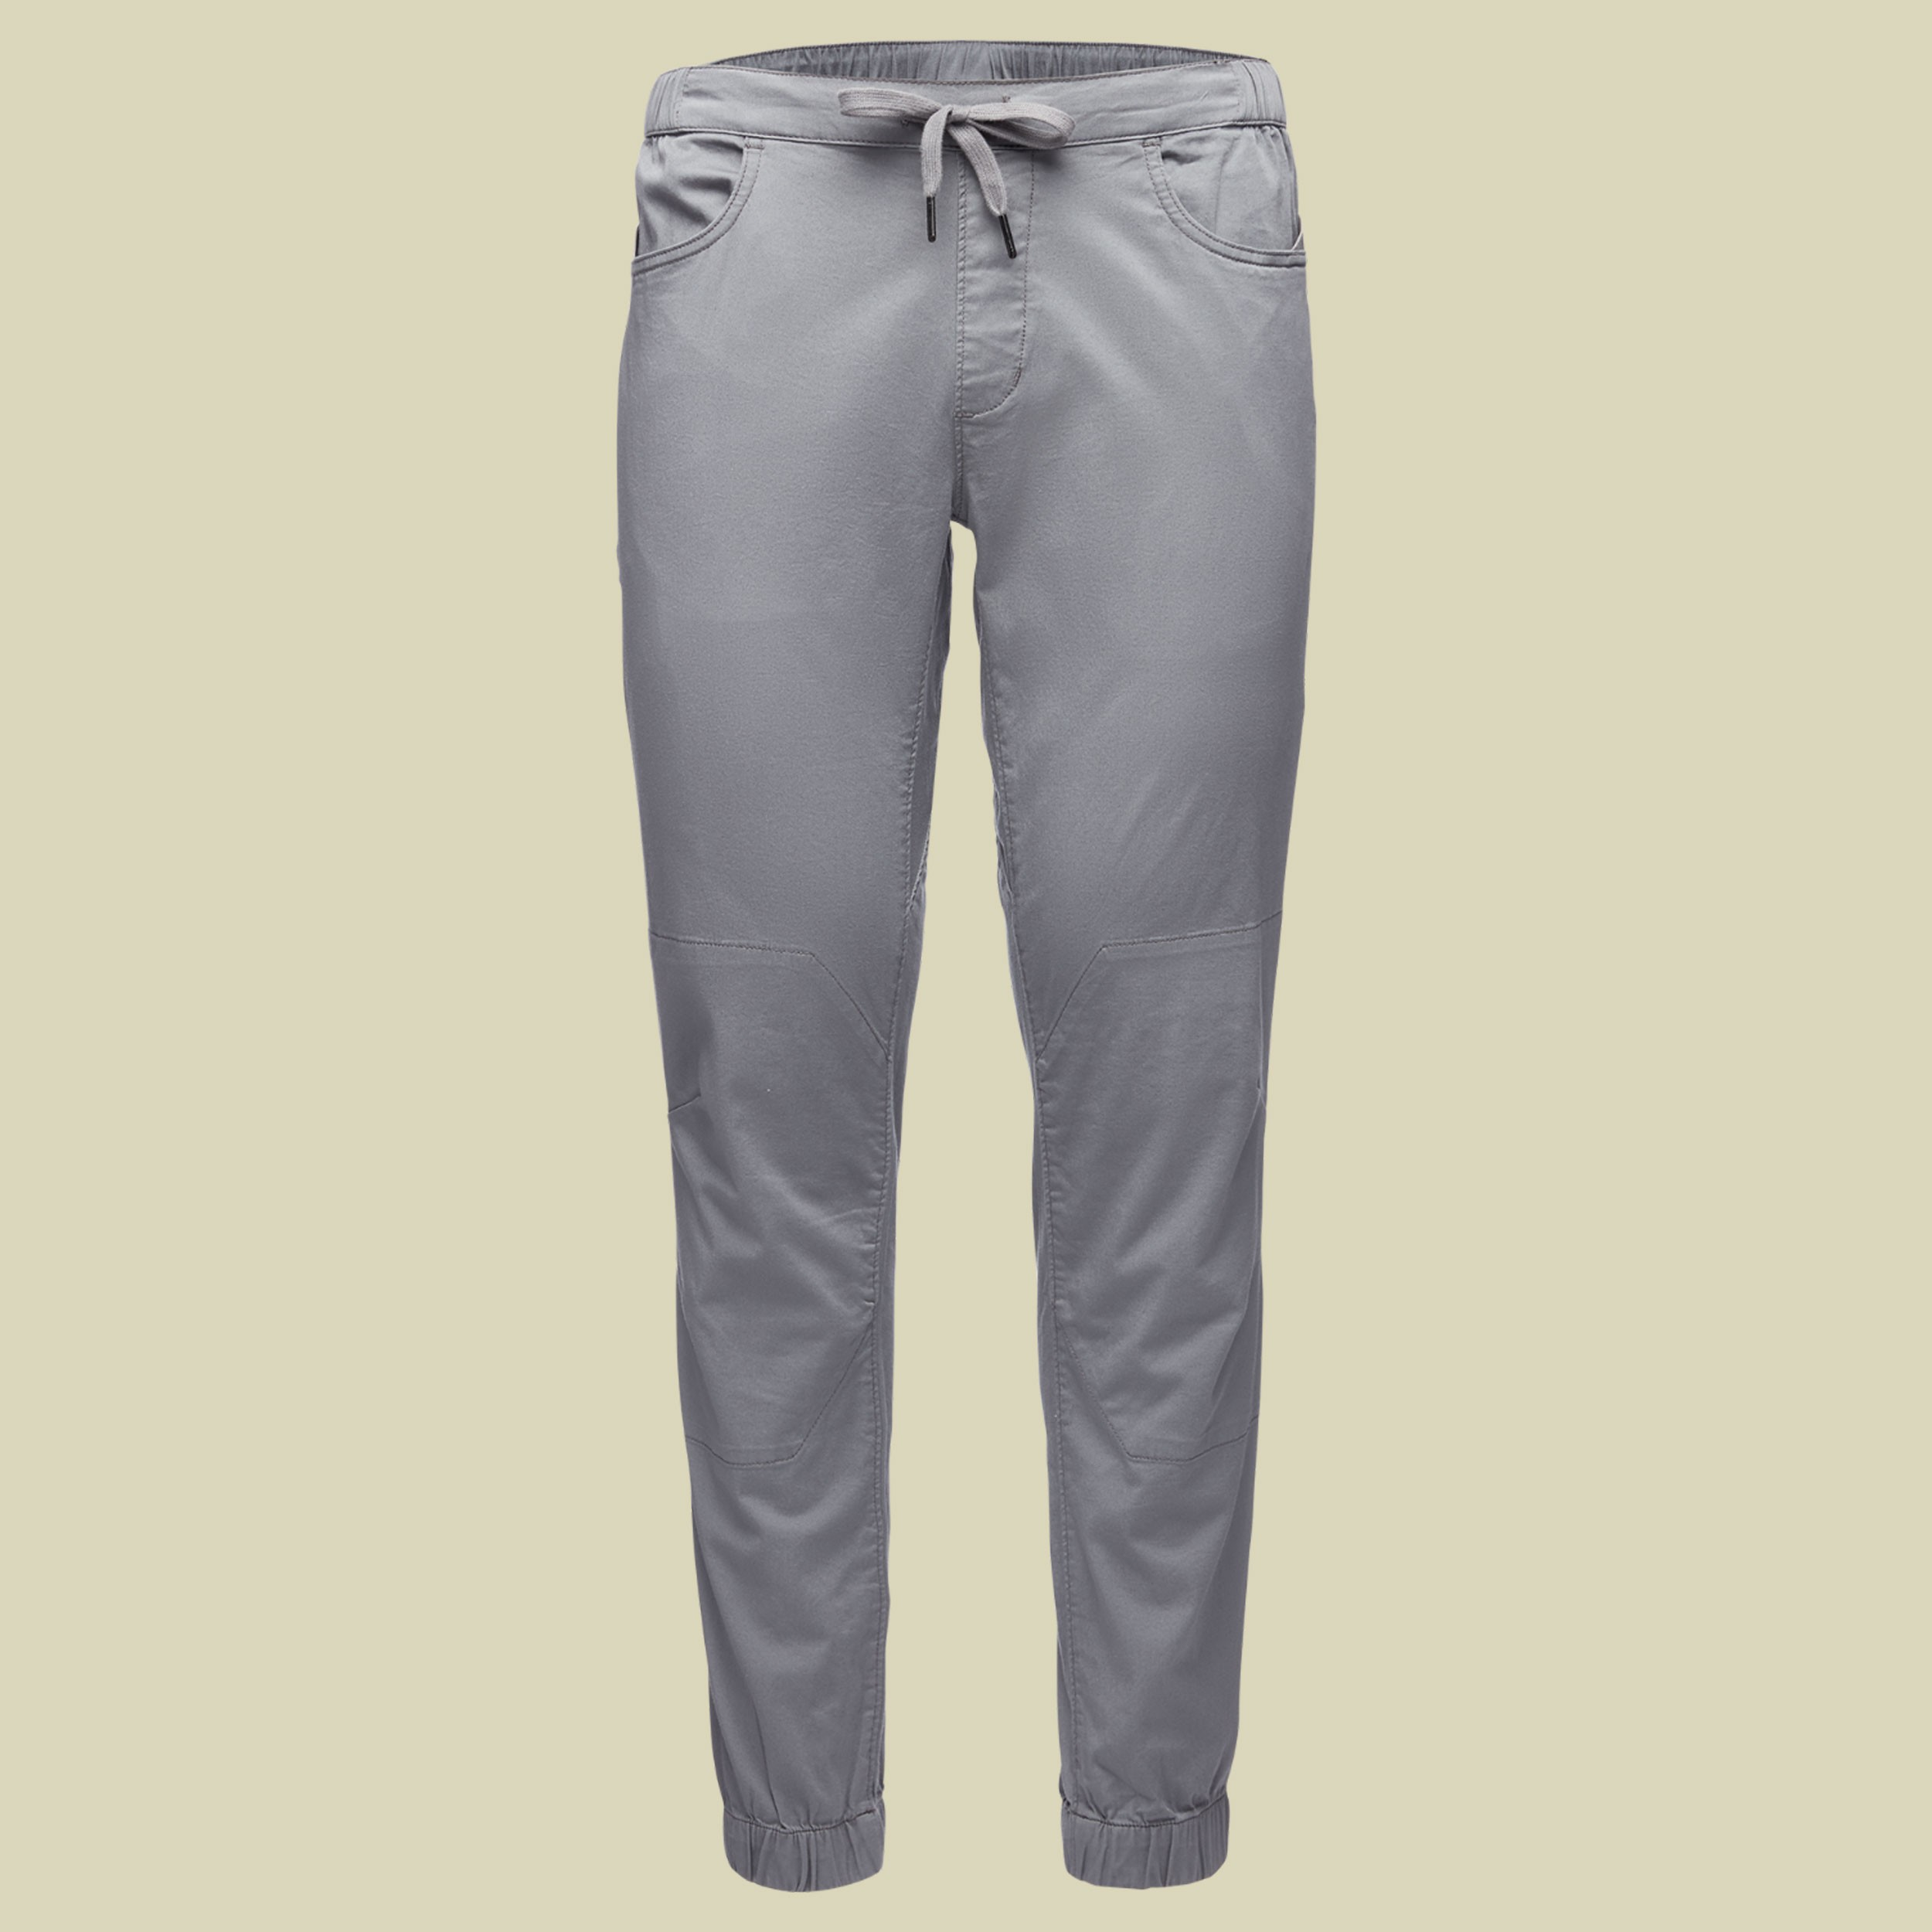 Notion Pants Men